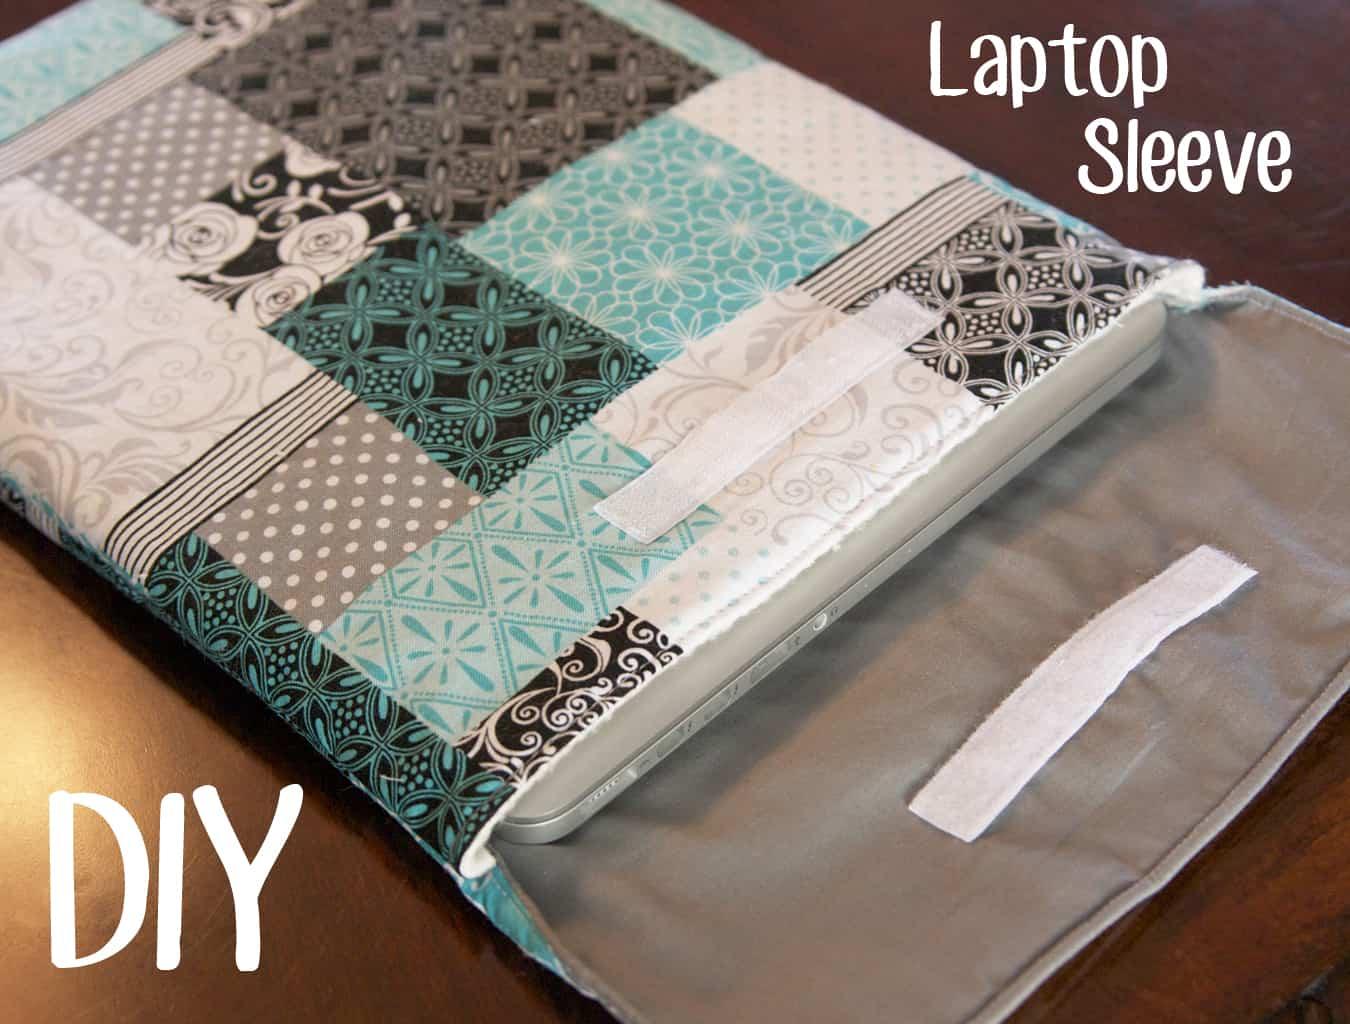 Velcro laptop sleeve